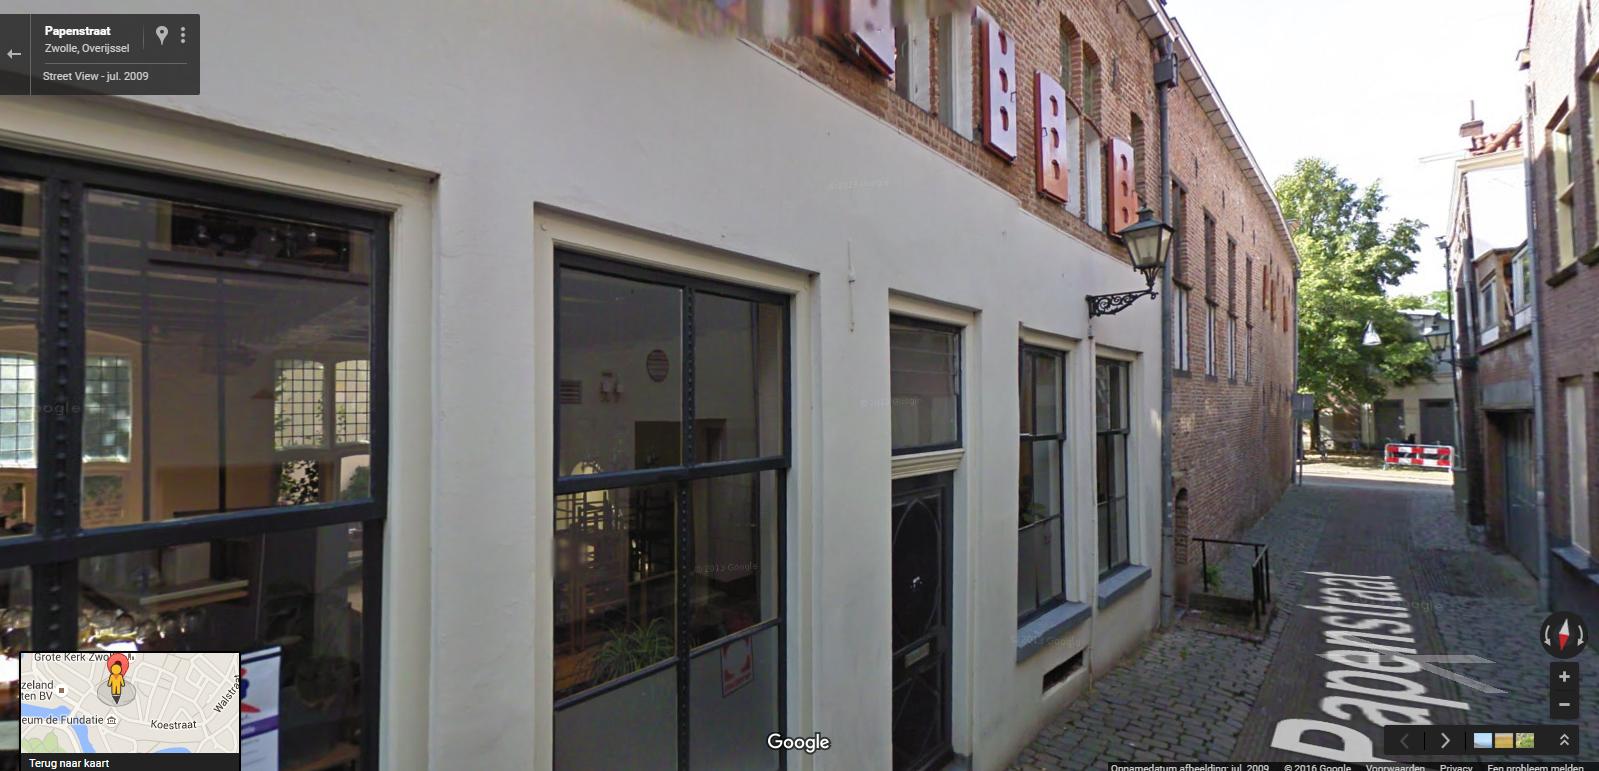 Papenstraat 9-14 Zwolle